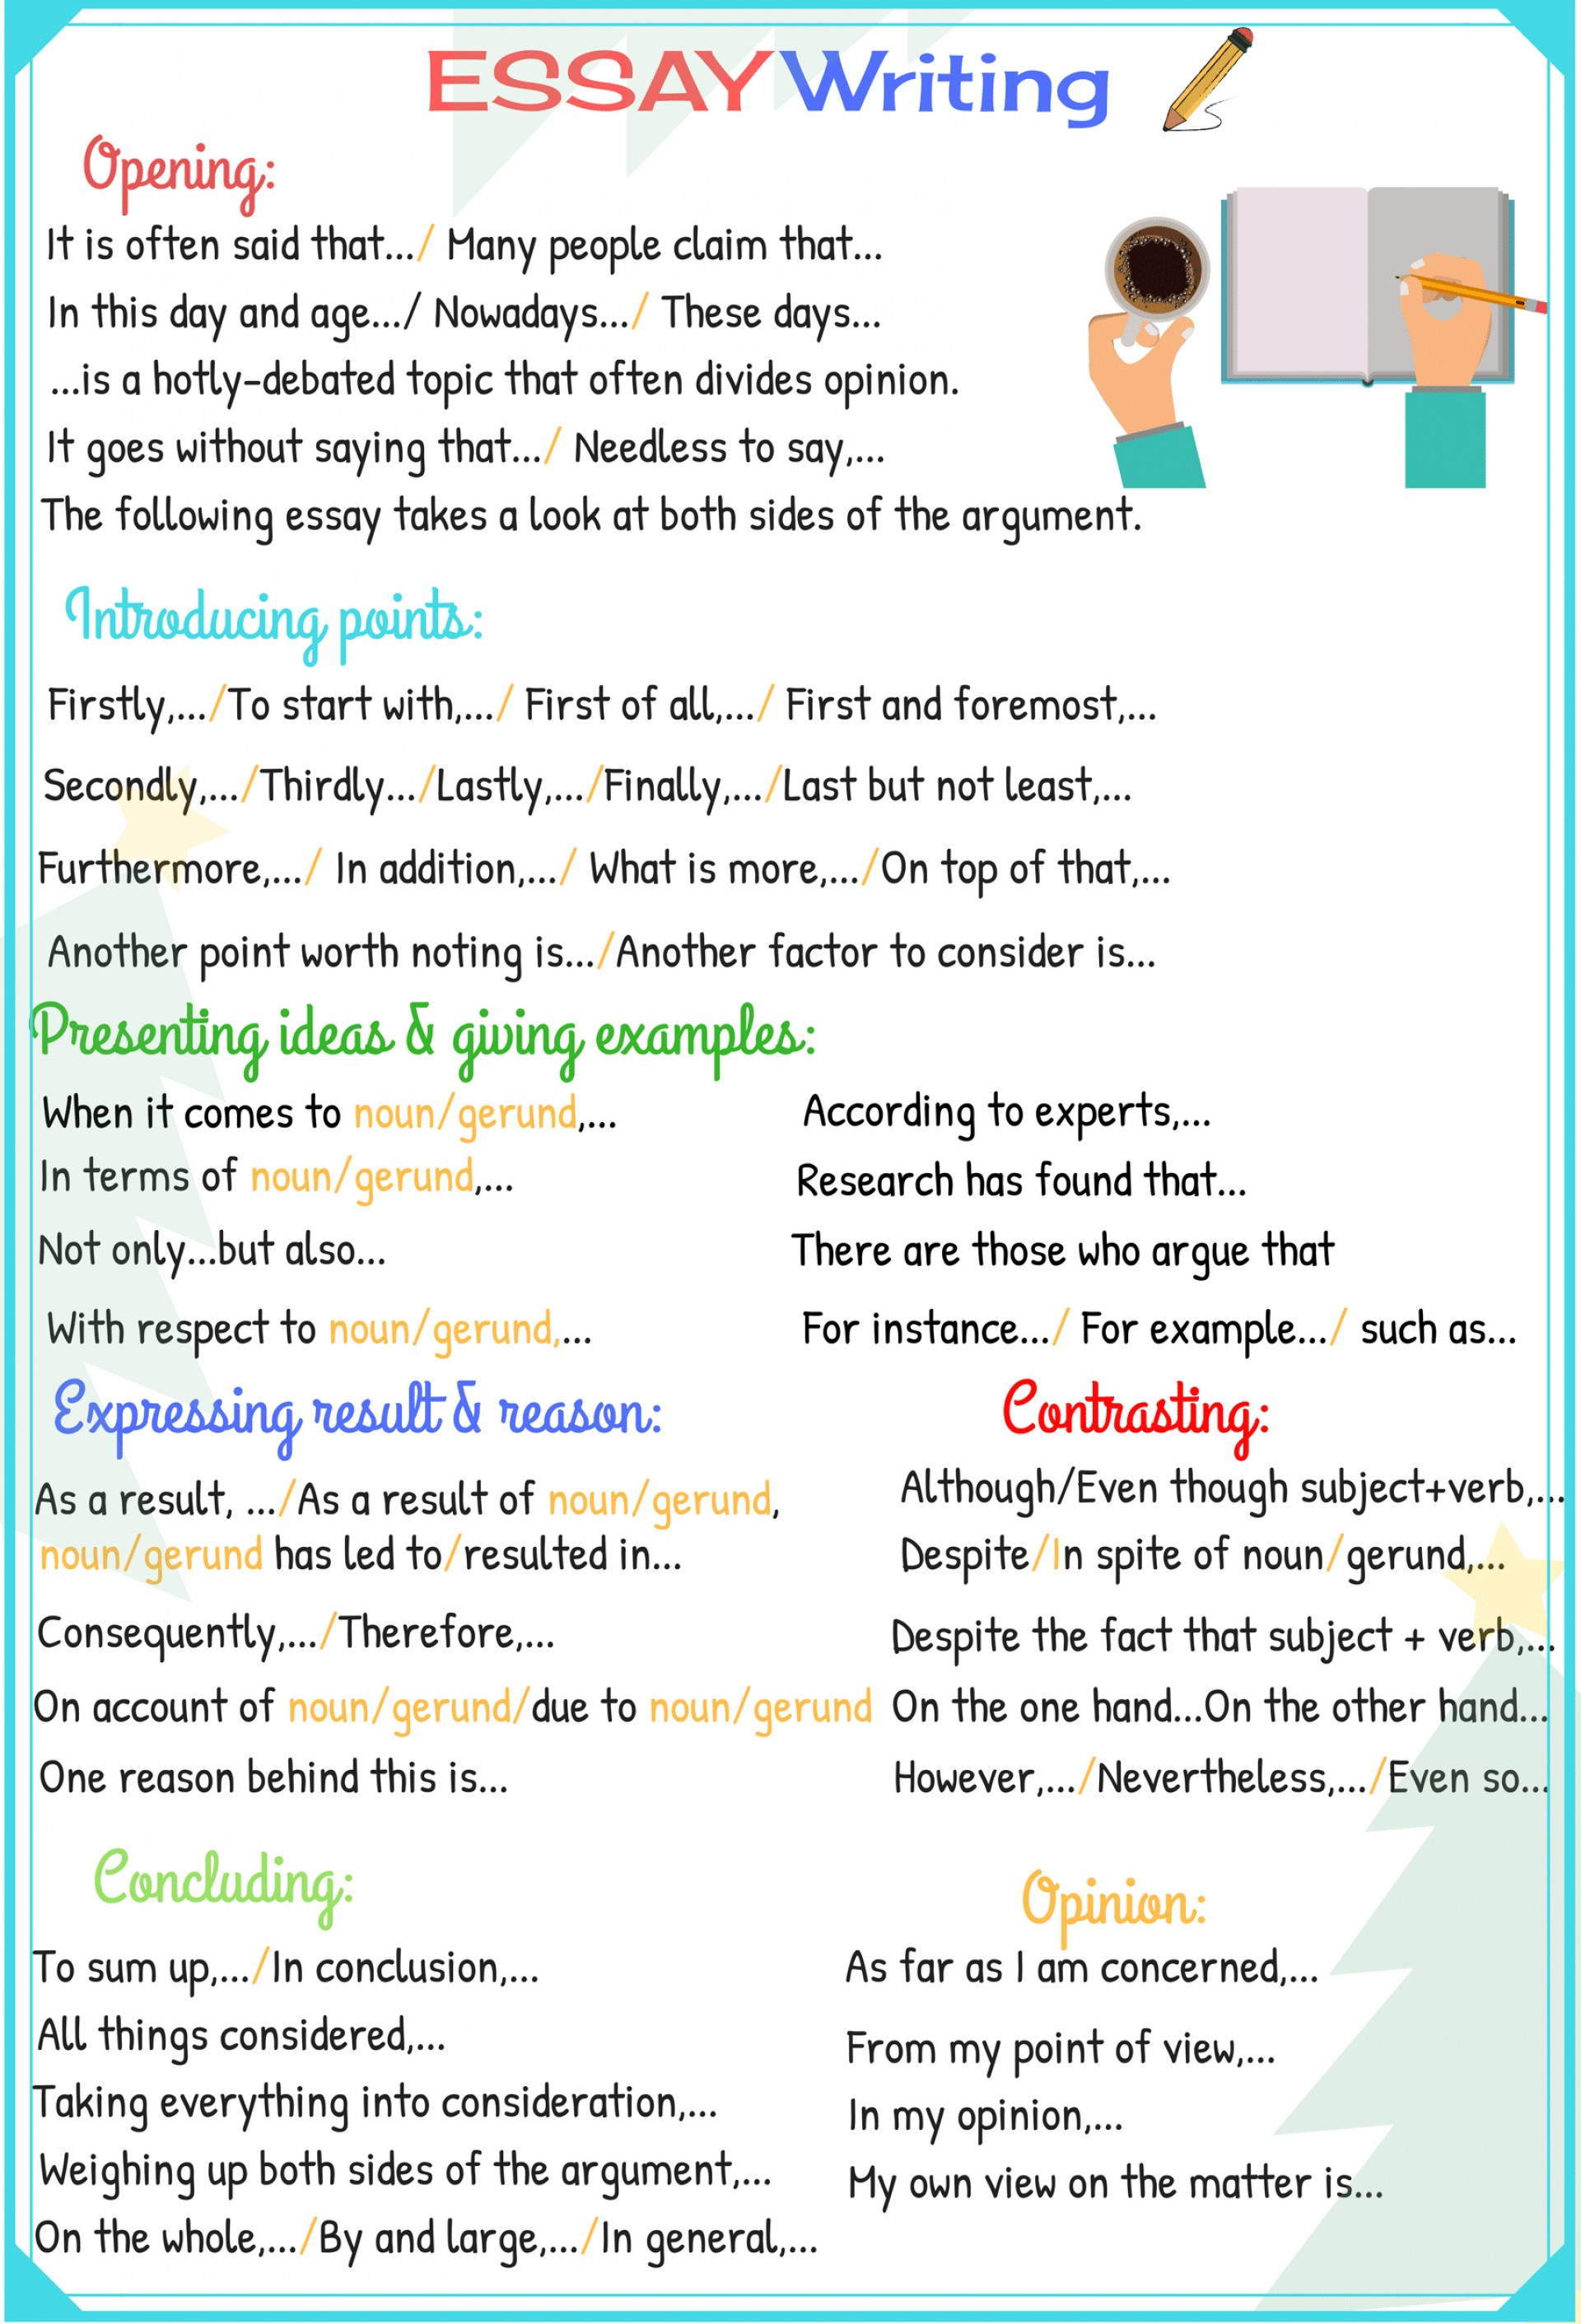 004 Essay Example Tips To Write Good Marvelous A Sat Descriptive Narrative 1920